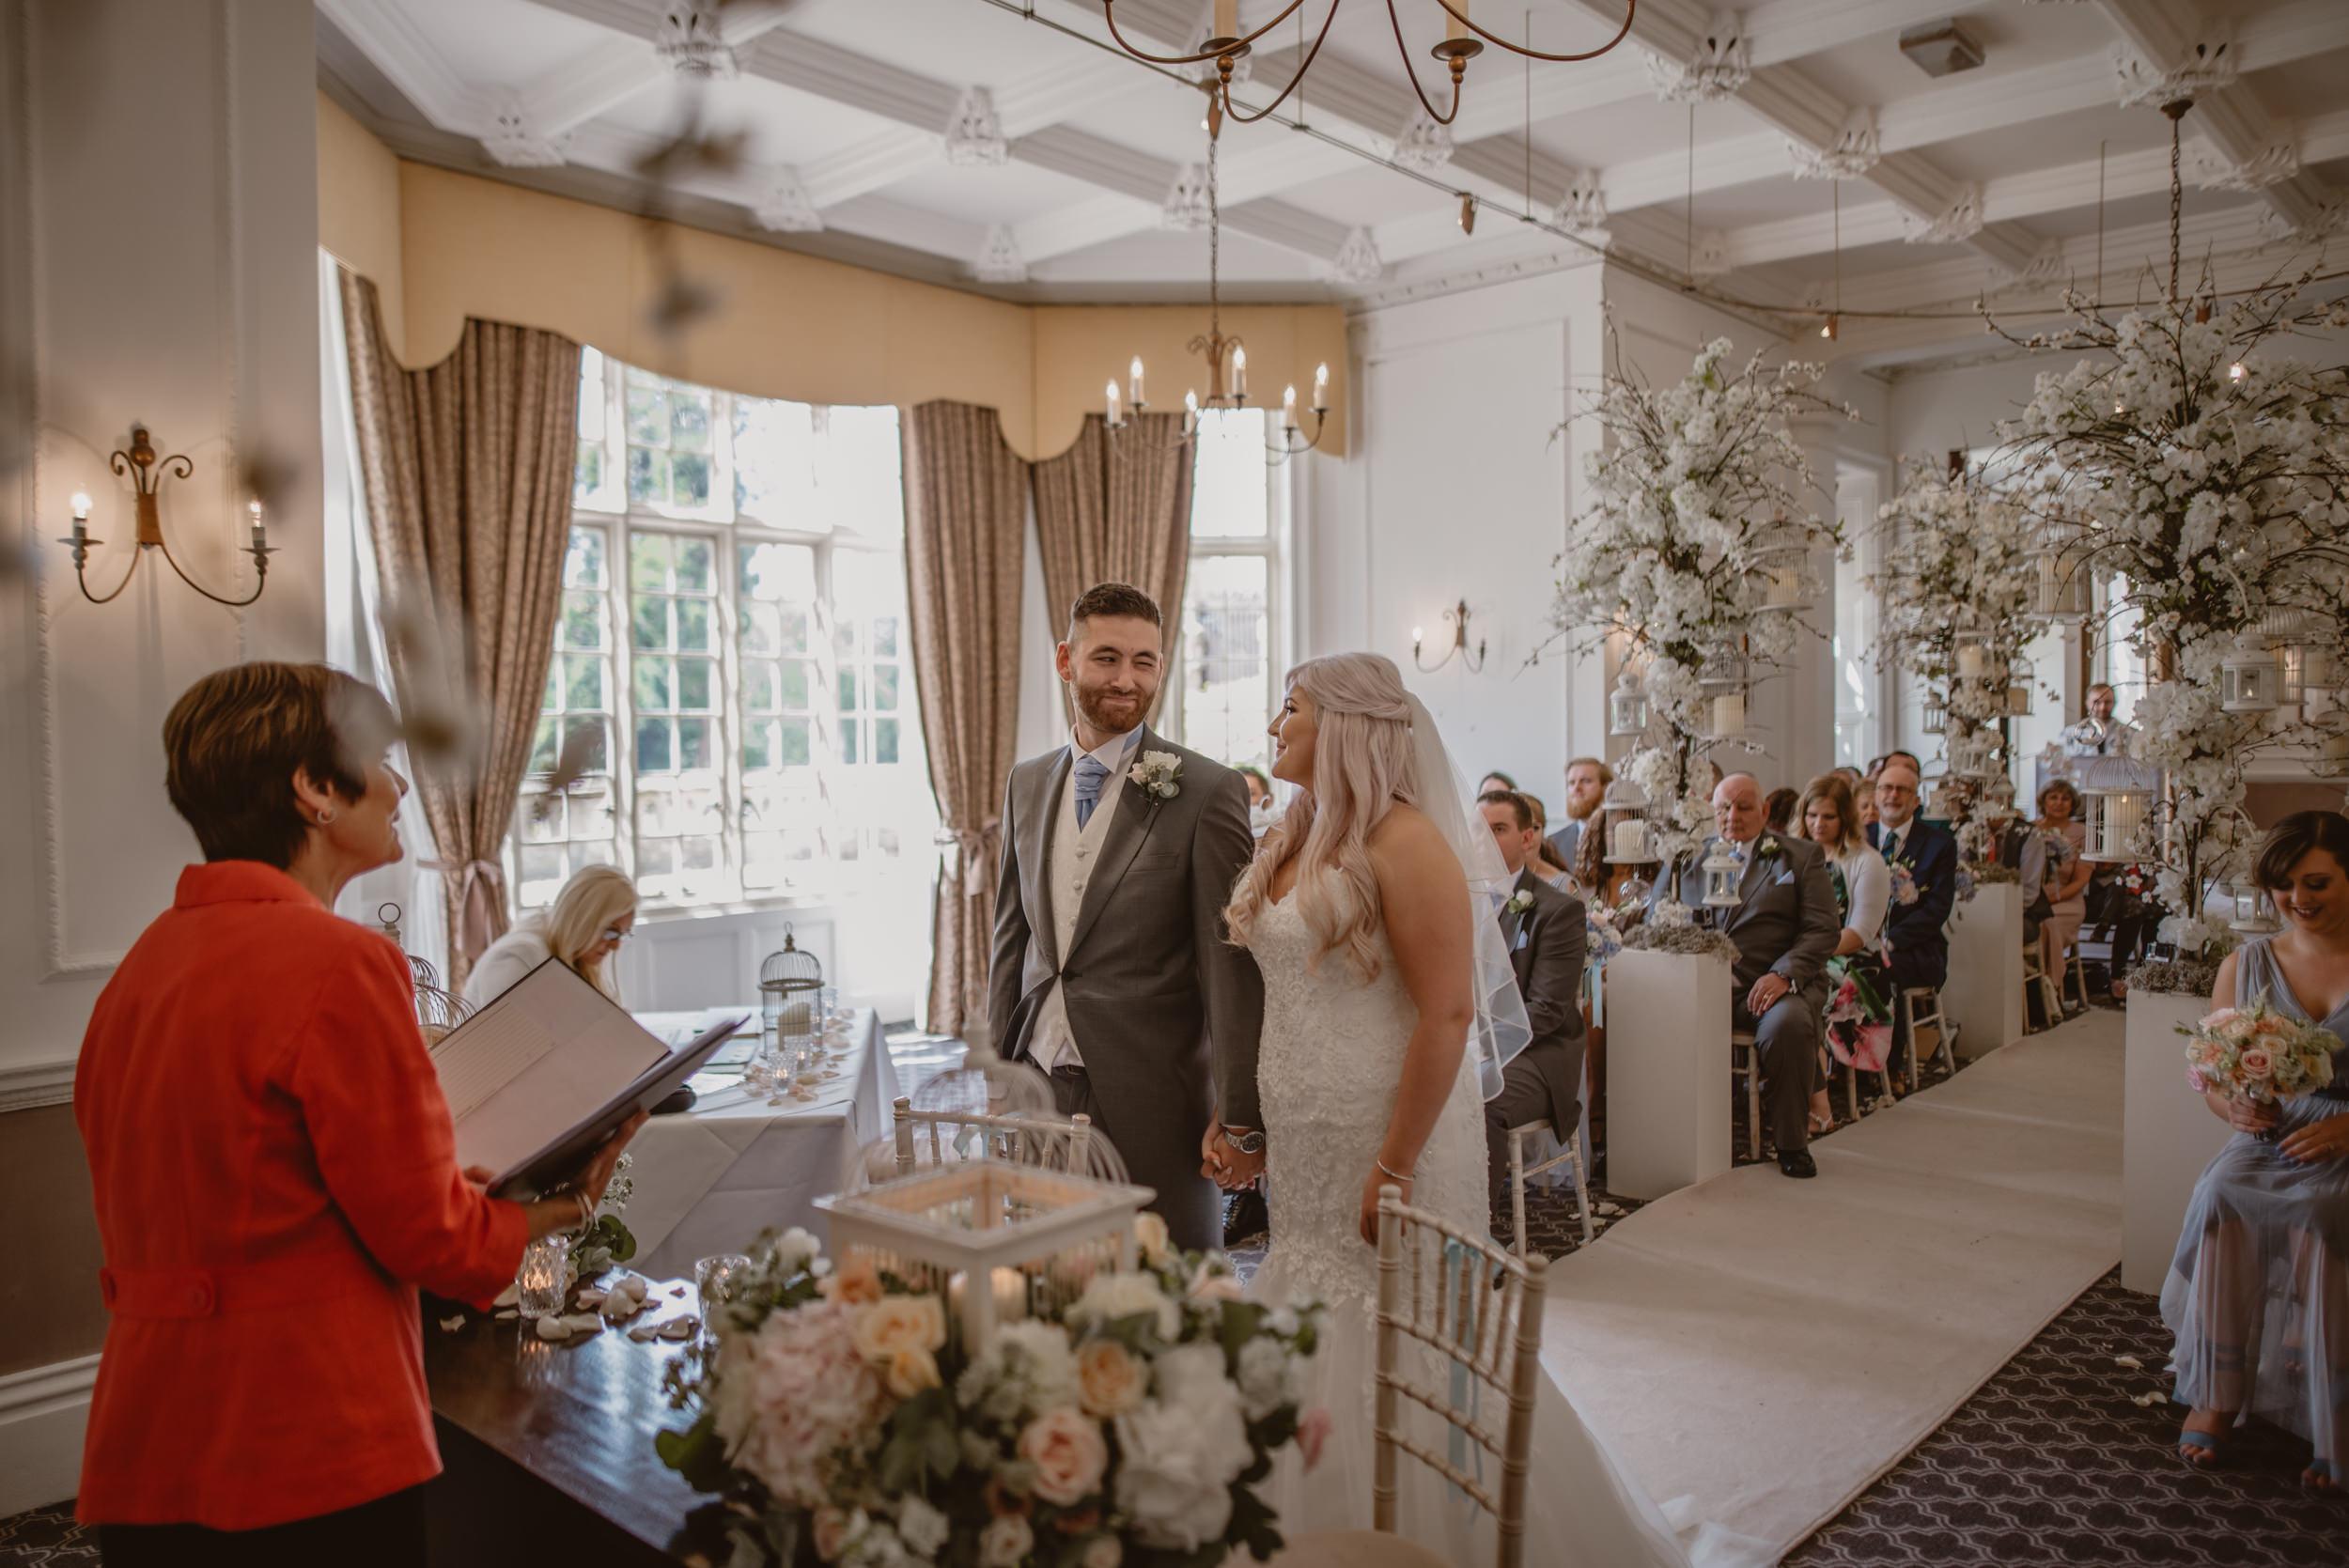 Rachel-and-James-Wedding-Horsley-Towers-State-Manu-Mendoza-Wedding-Photography-227.jpg